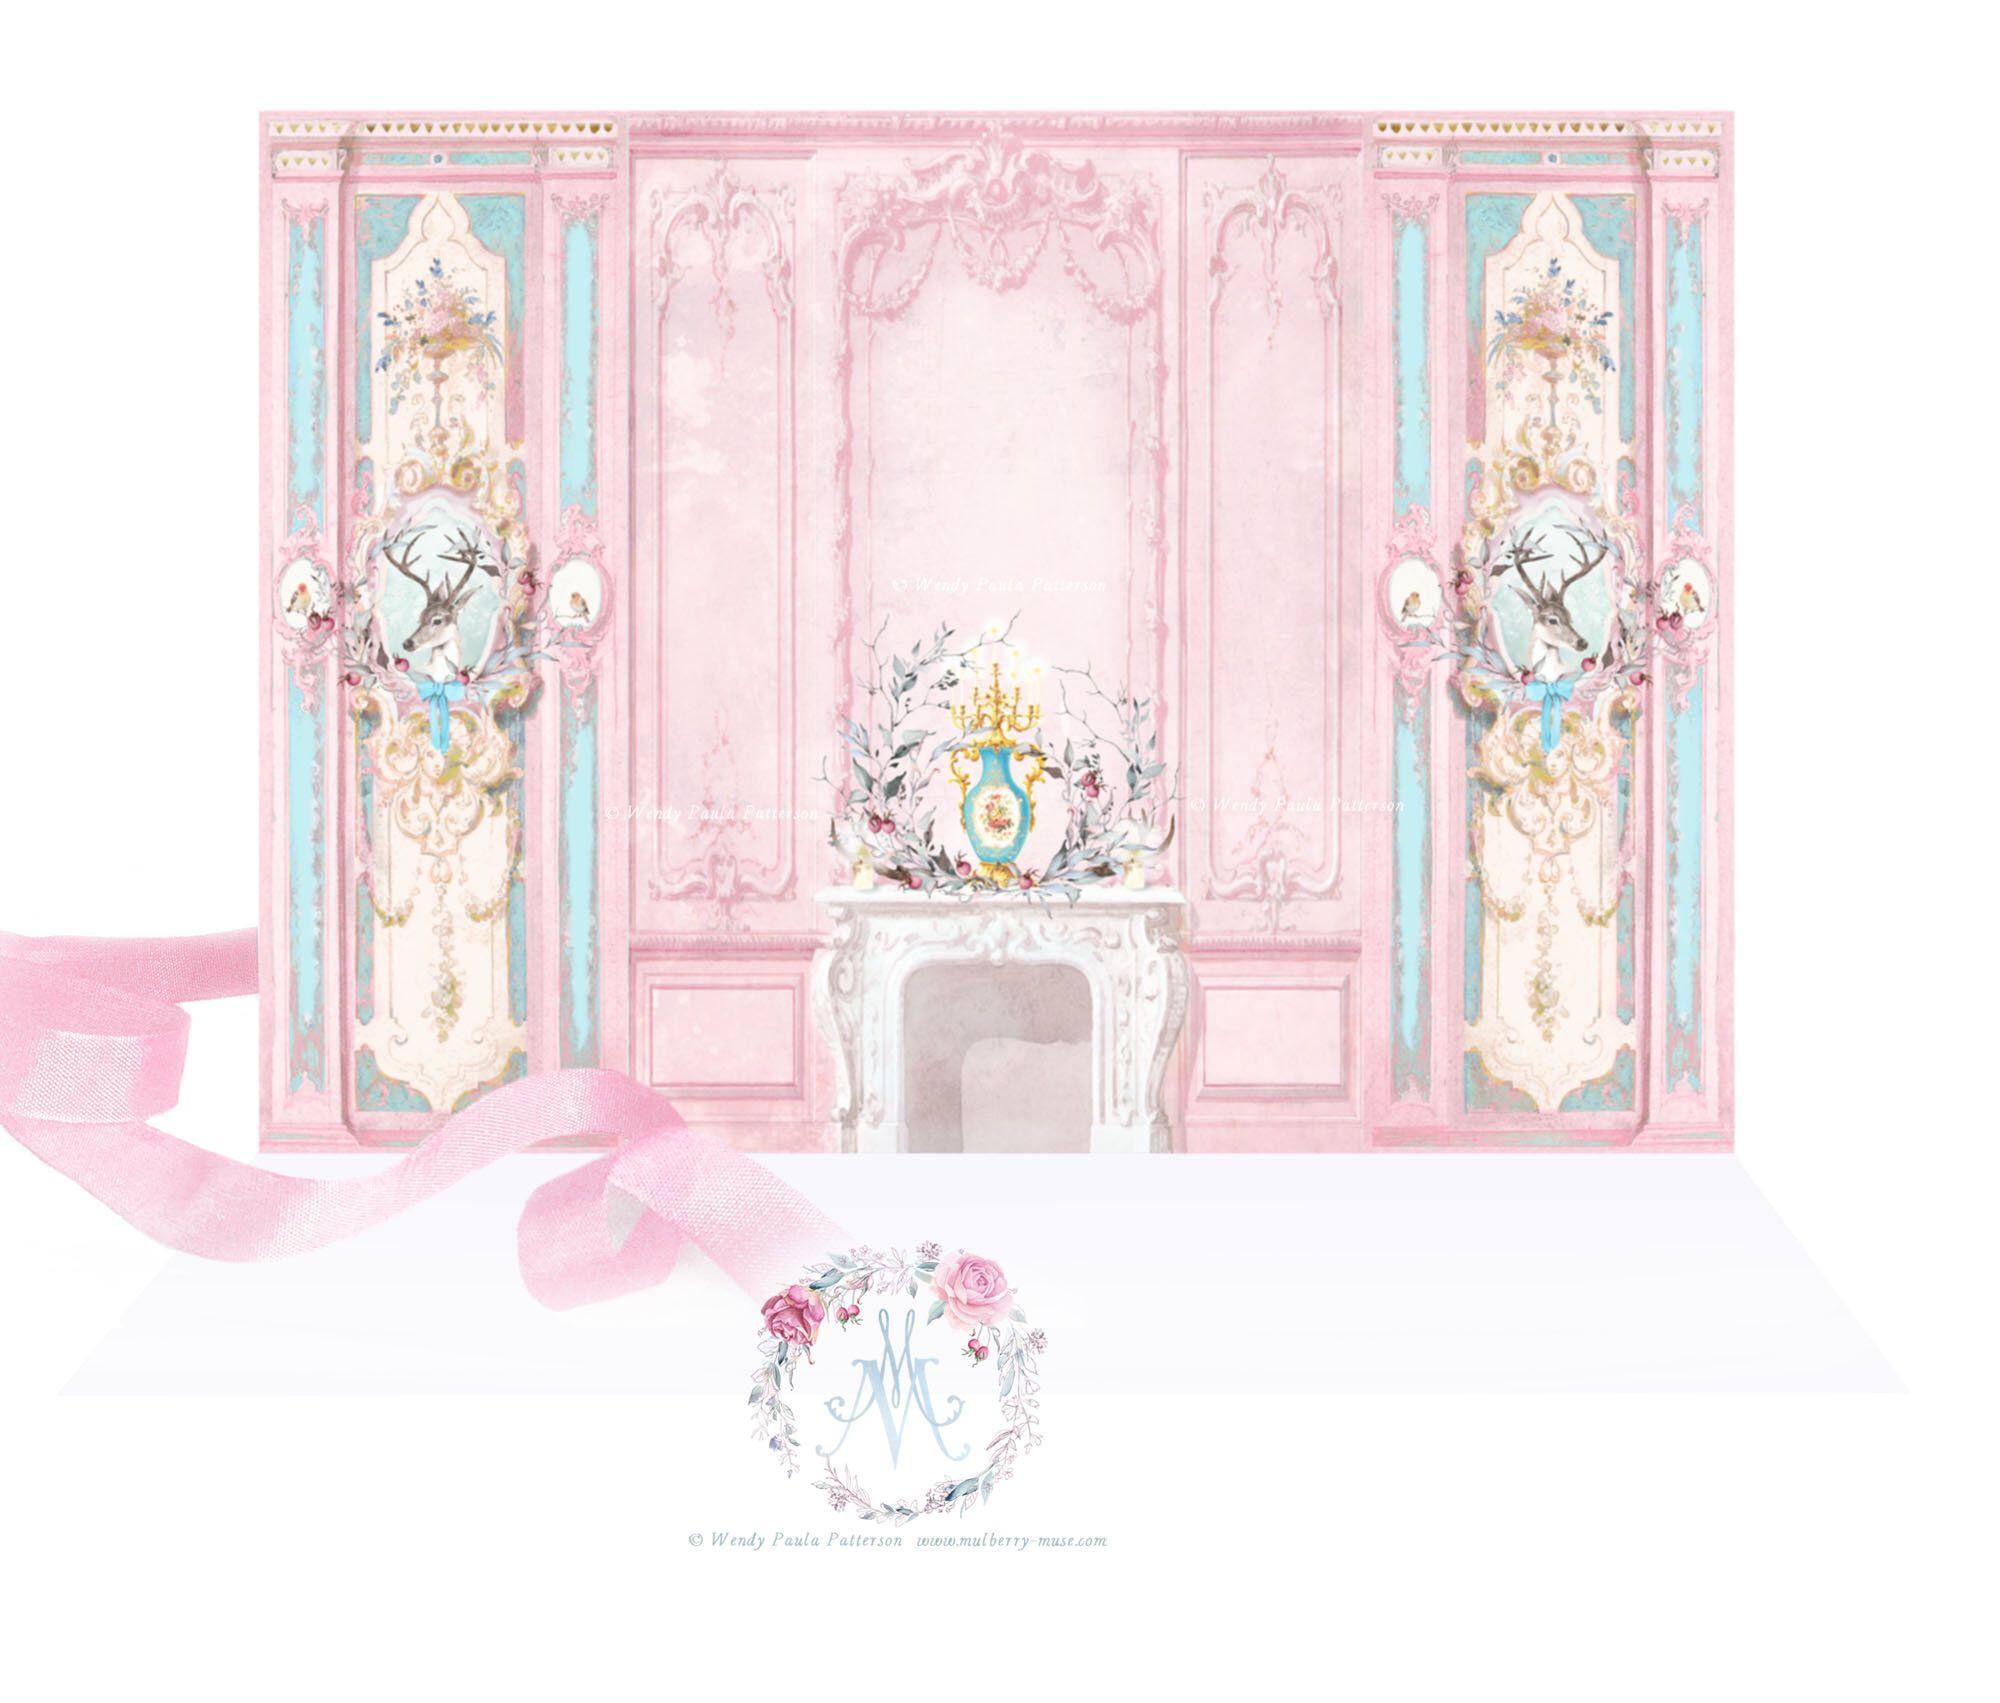 Dollhouse Miniature Trim Trim Floral and Cherub Wallpaper Border